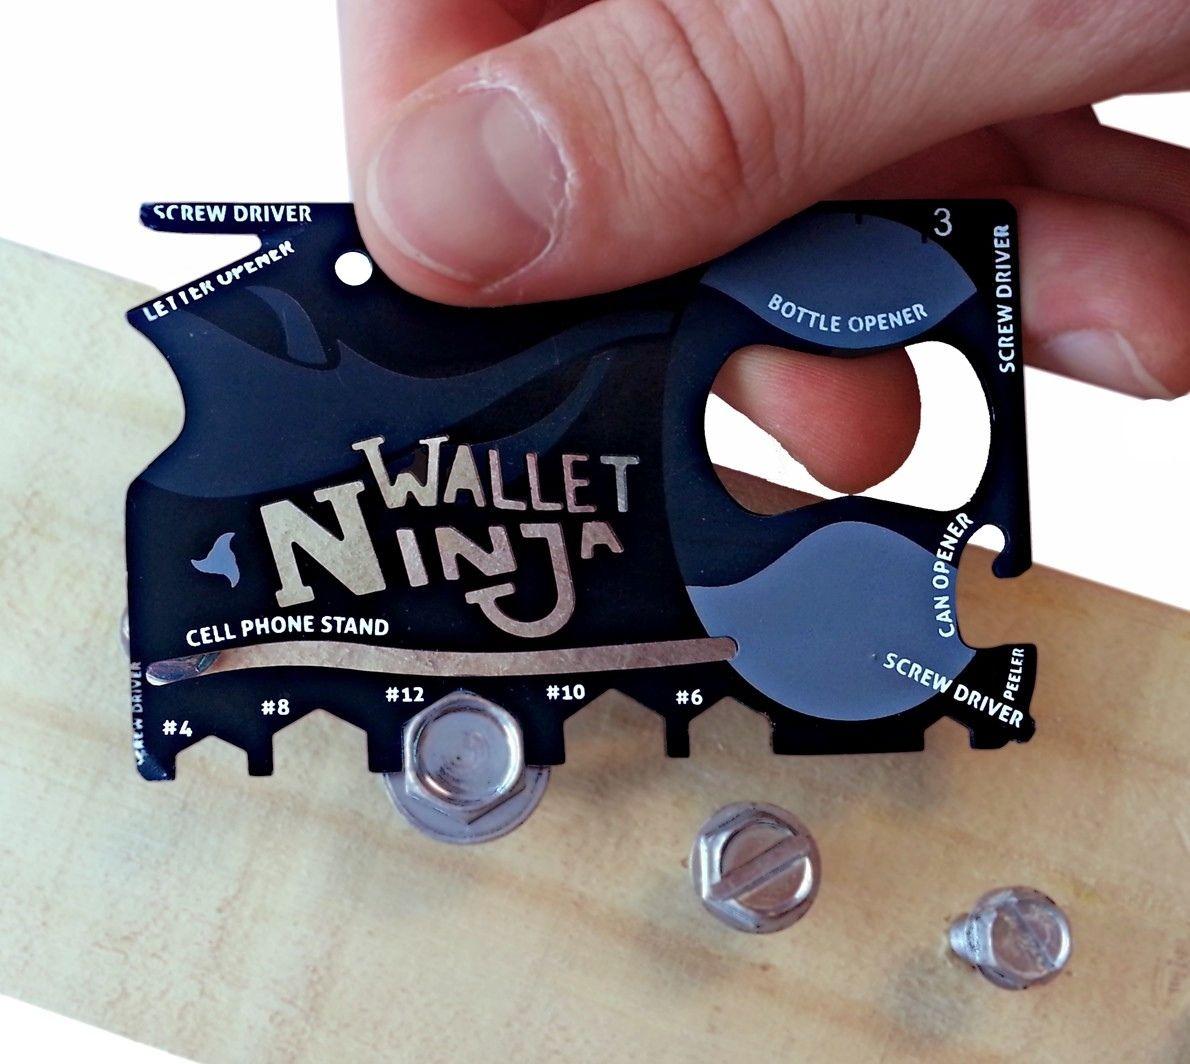 Wallet Ninja 18 In 1 Credit Card Sized Multi Tool